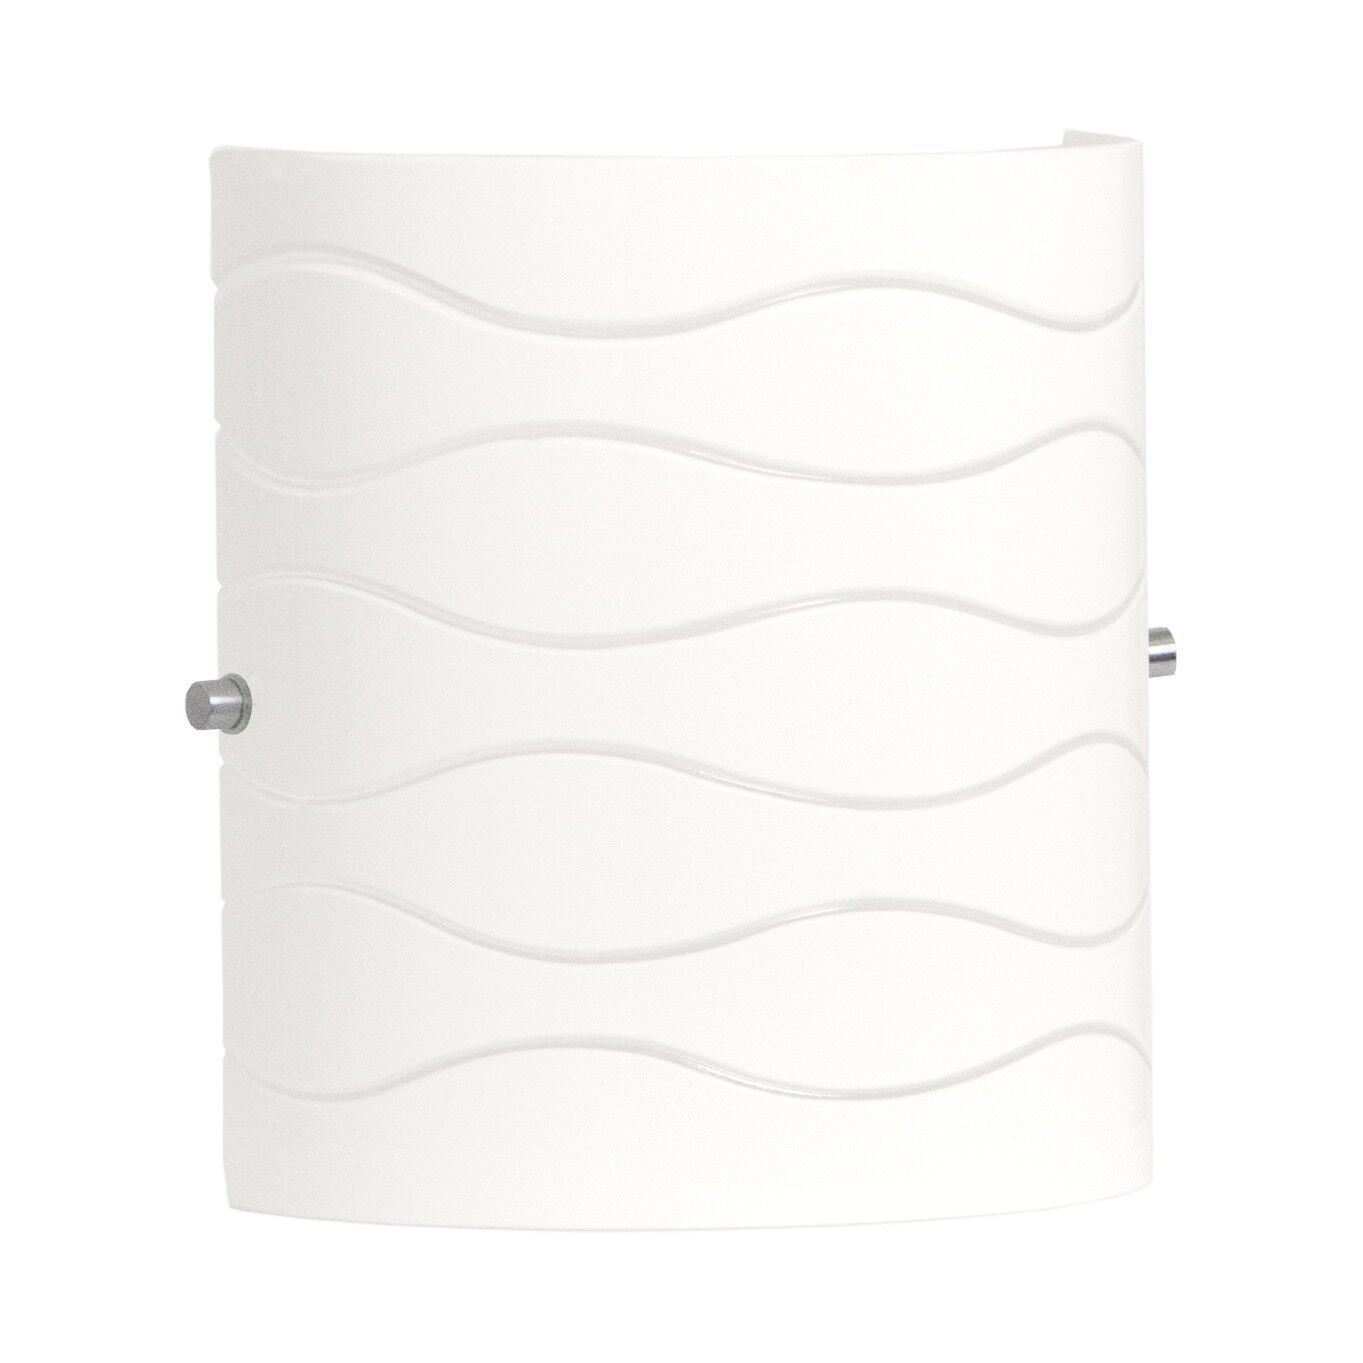 Avellina 1 Light Wall Sconce Lighting Fixture - Carved Opal Glass - Linea di Liara LL-WL828